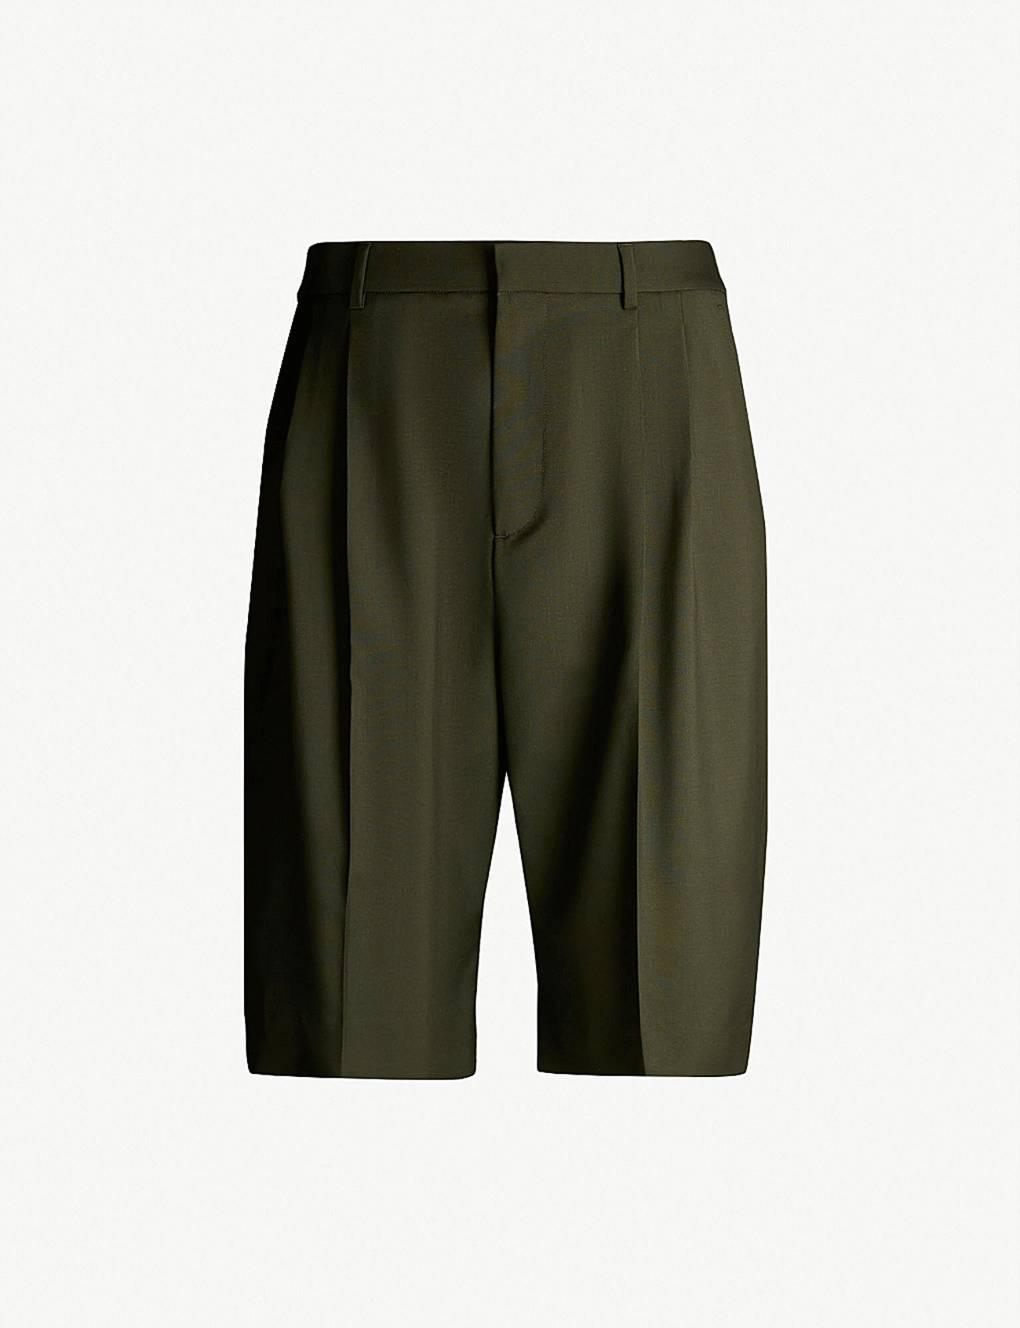 Biker Style Shorts